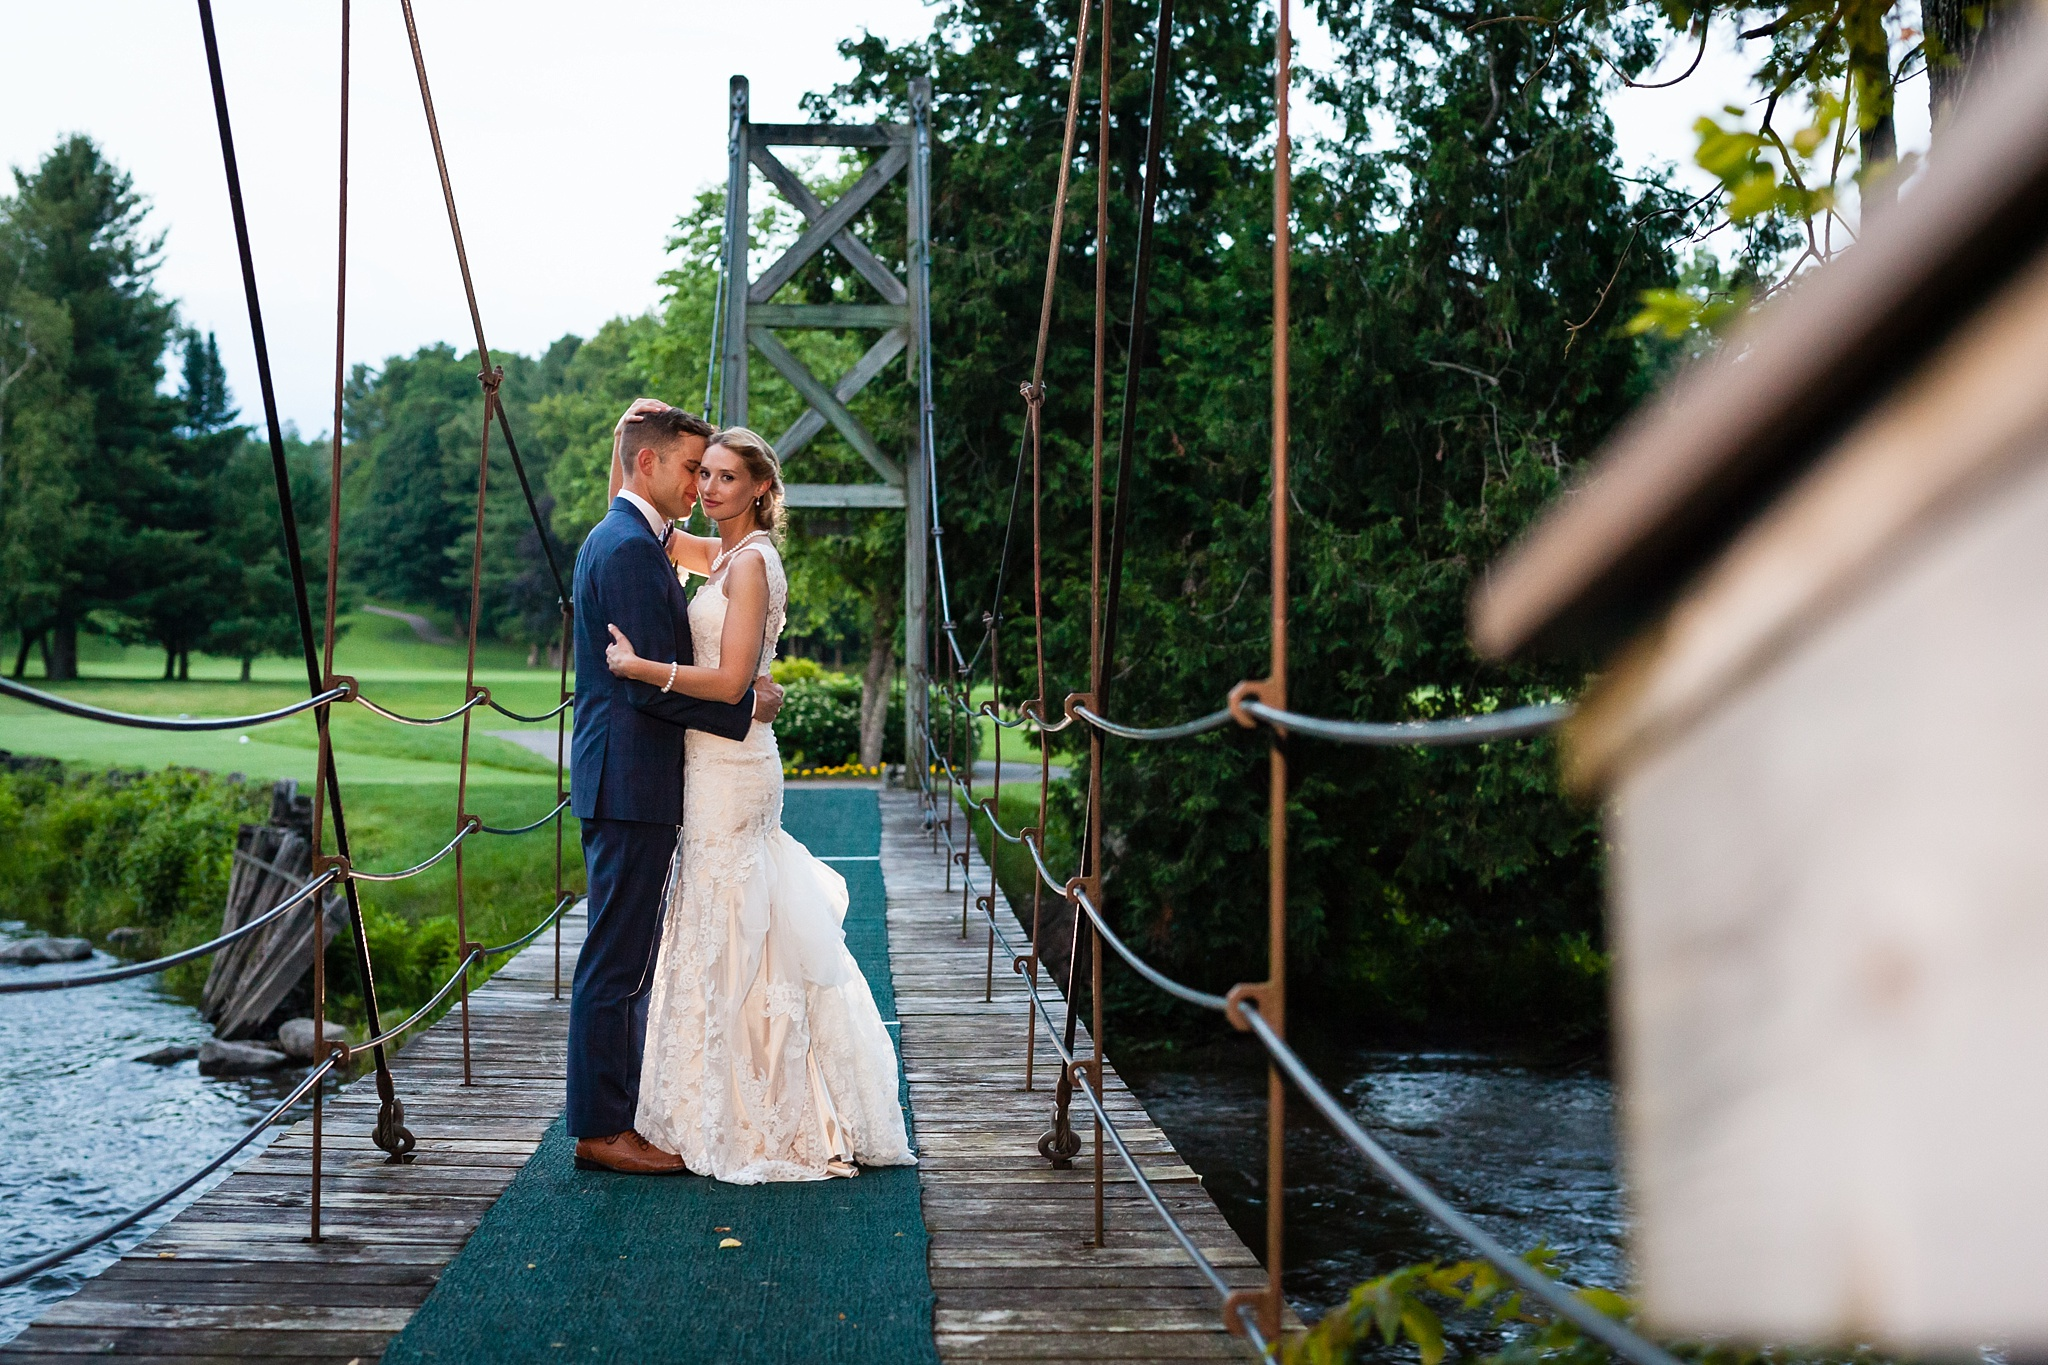 Becky_Cameron_Grand_Rapids_Blythefield Country_Club_Wedding065.JPG